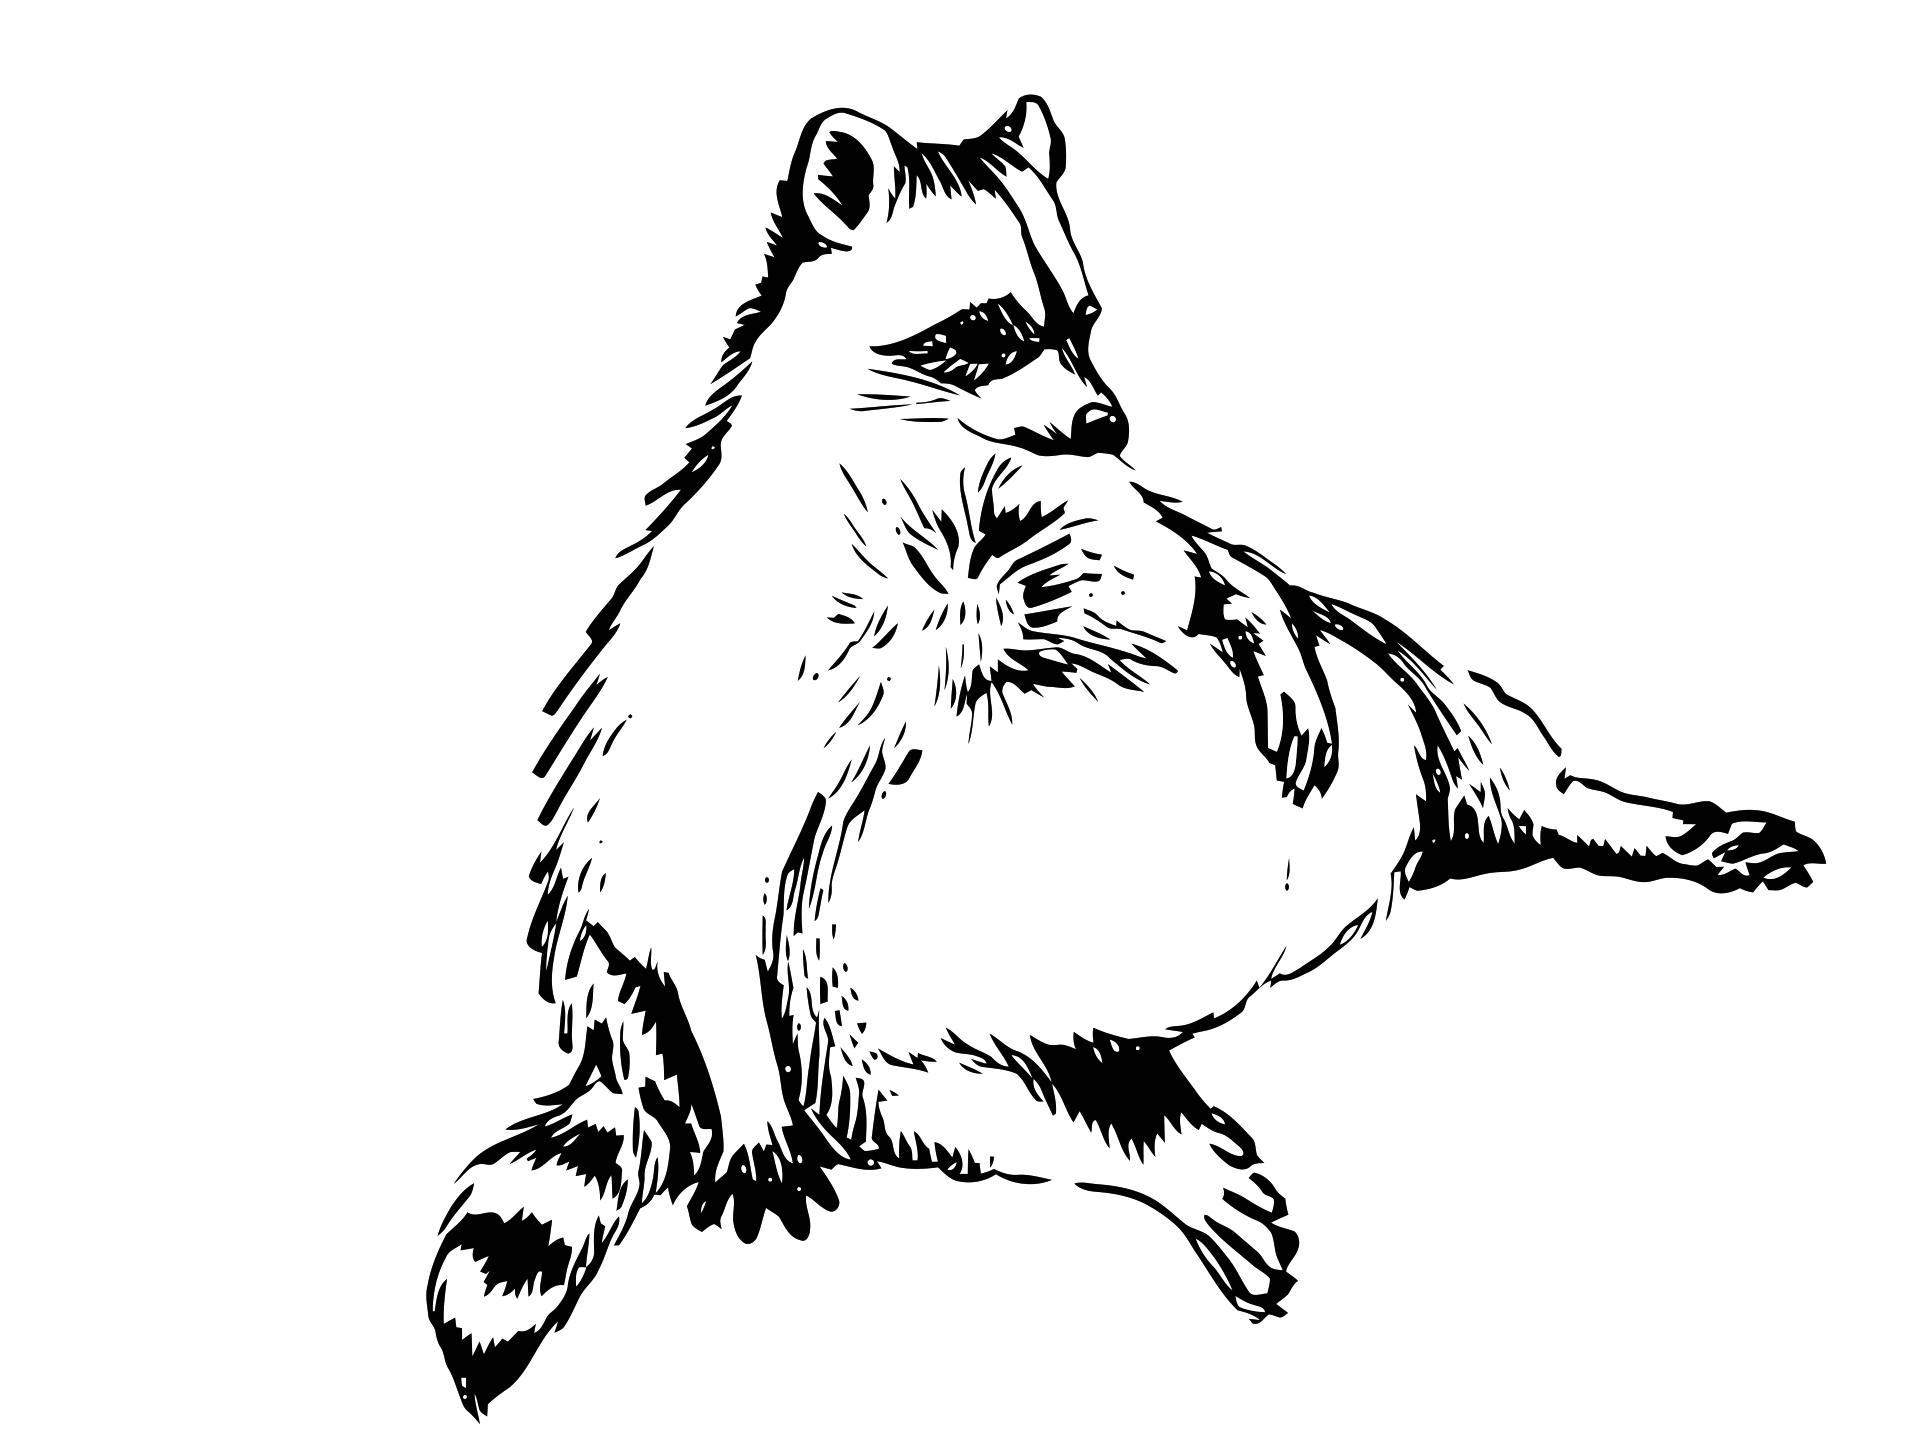 Drawn raccoon simple Vectorized fat your raccoon drew